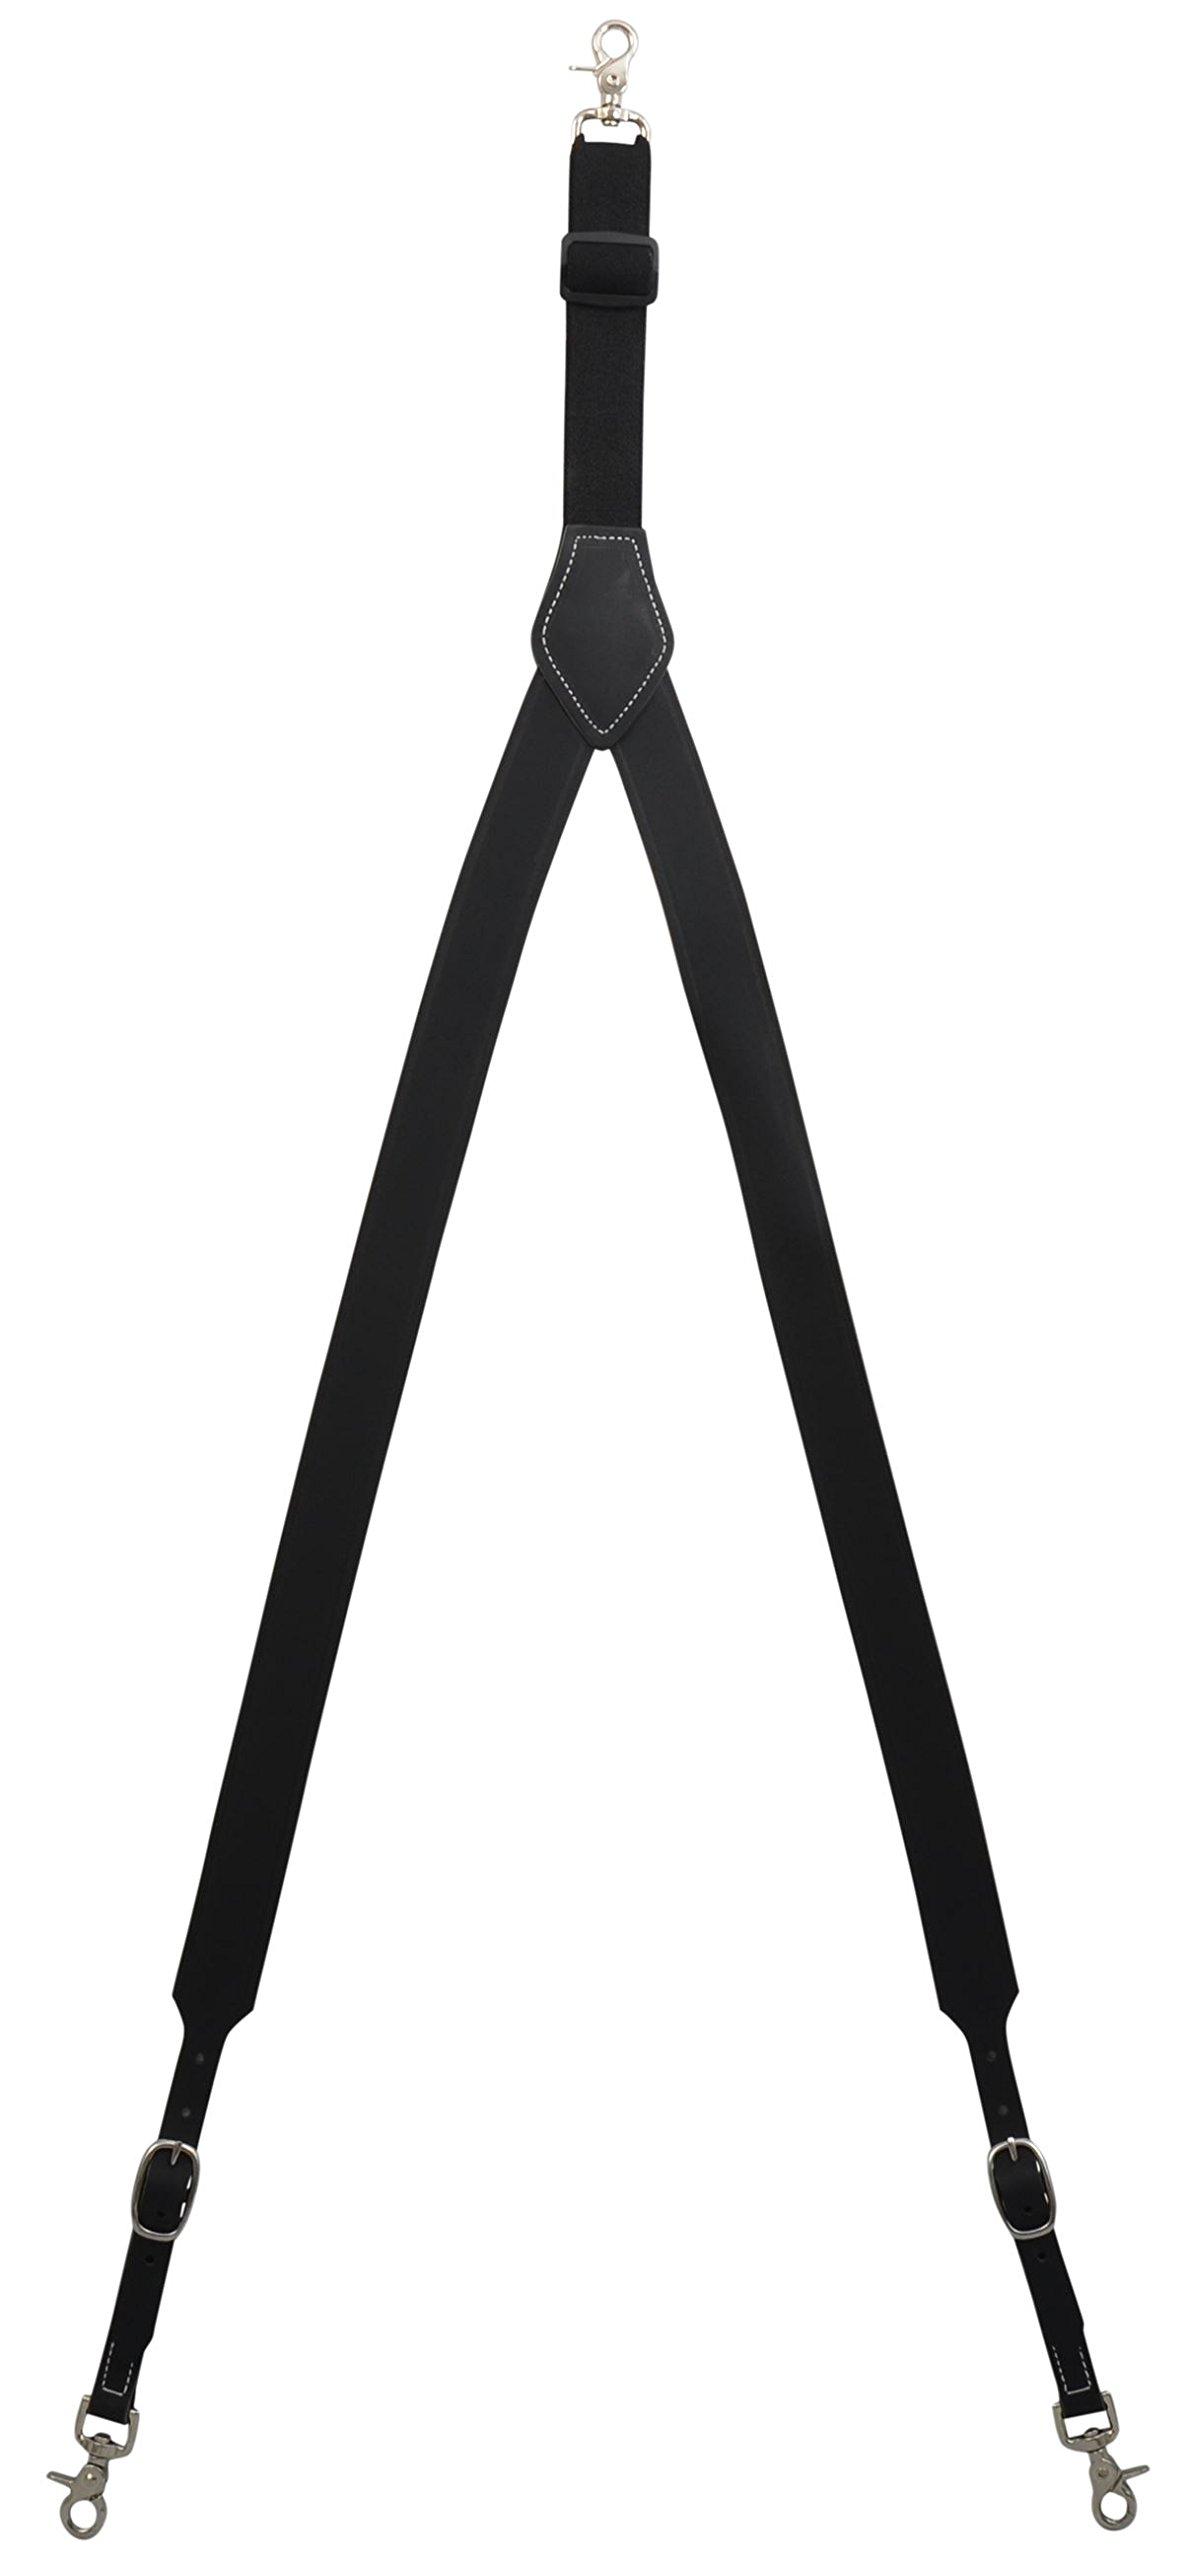 3D Tan Leather Suspenders